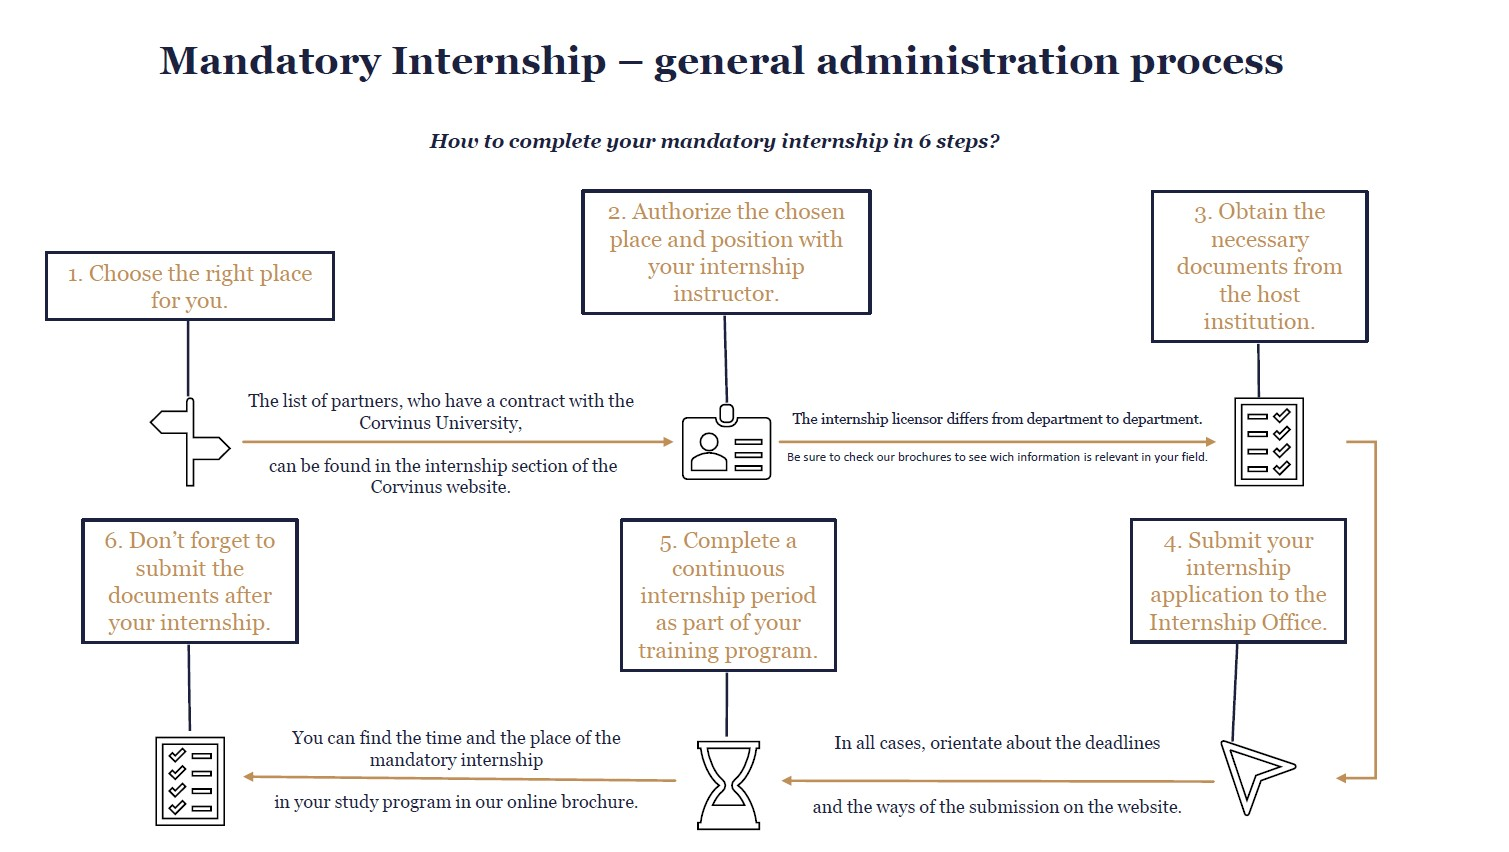 Mandatory-Internship-general-administration-process.jpg